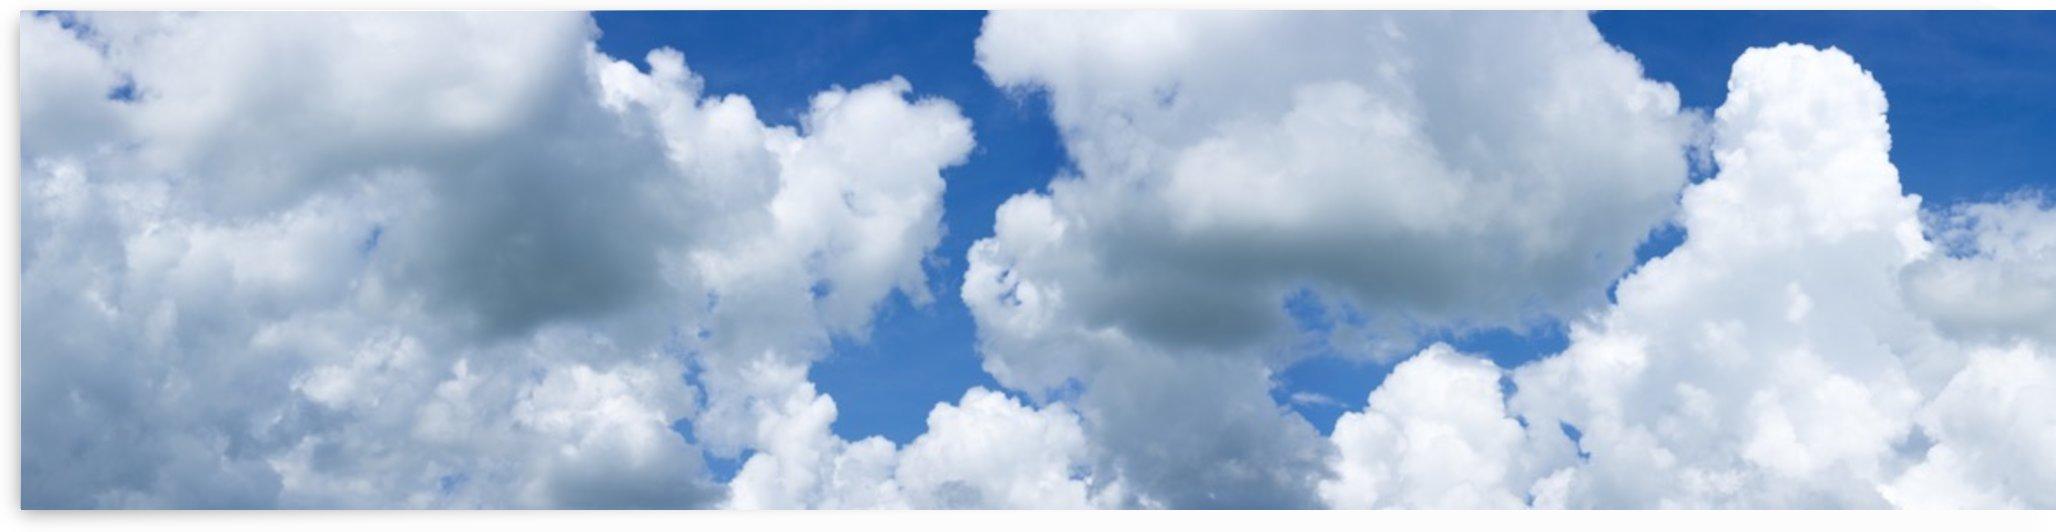 Clouds in a blue sky; Alberta, Canada by PacificStock